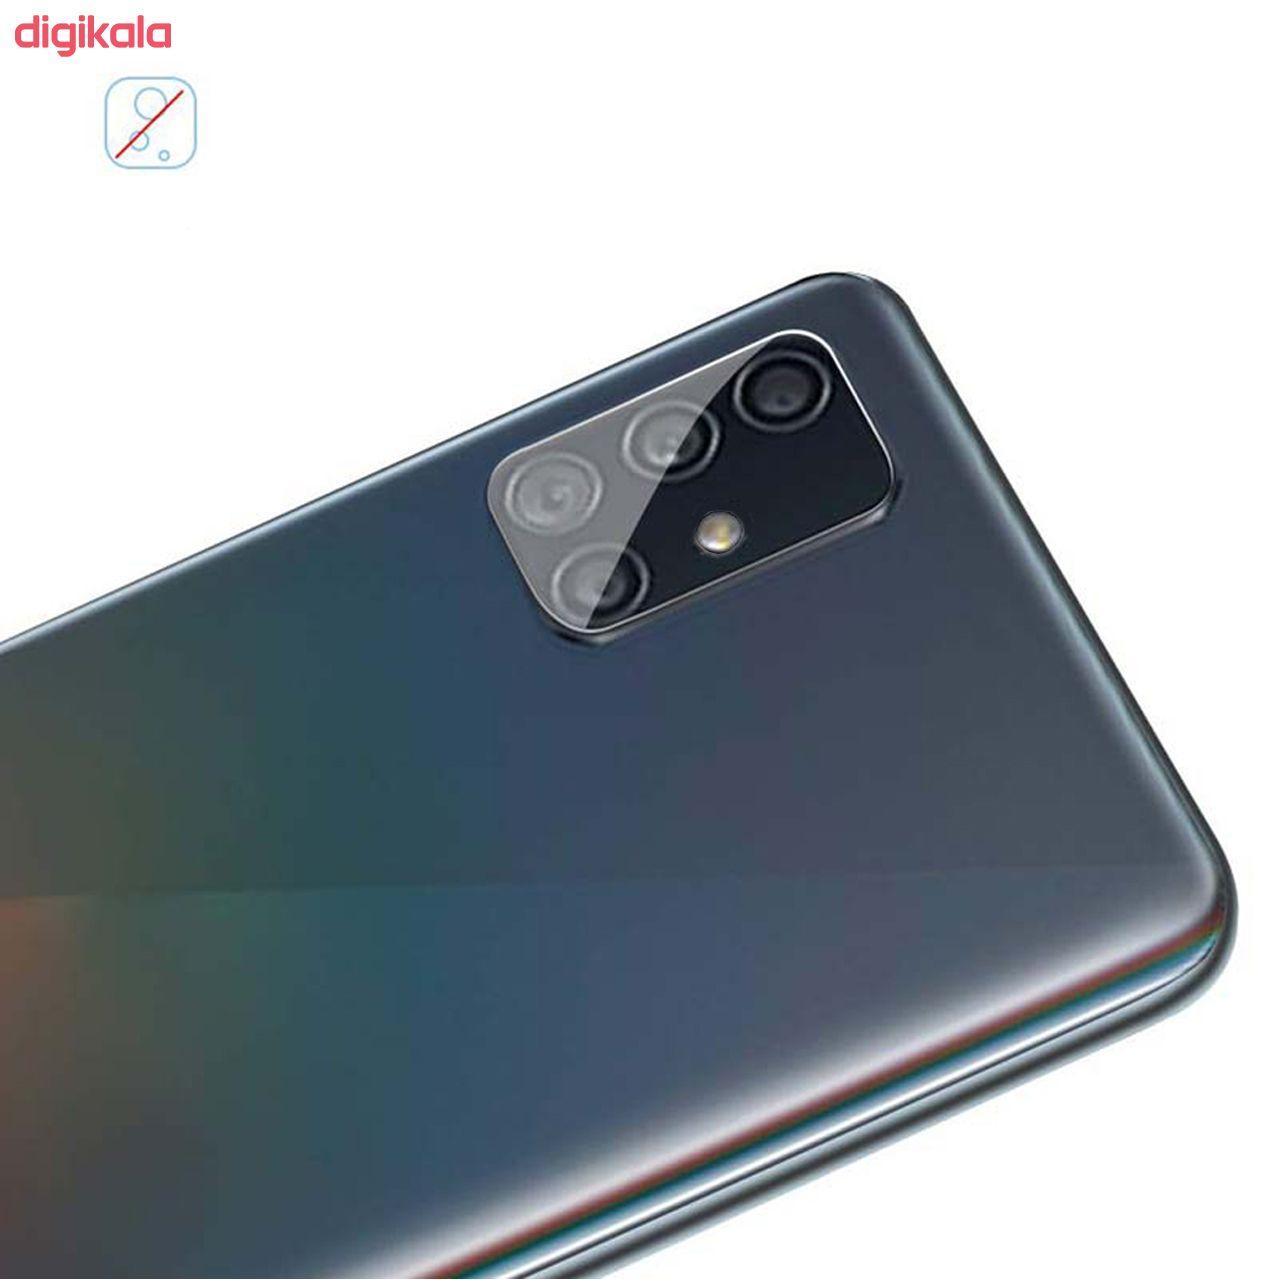 محافظ لنز دوربین سیحان مدل GLP مناسب برای گوشی موبایل سامسونگ Galaxy A51 main 1 6